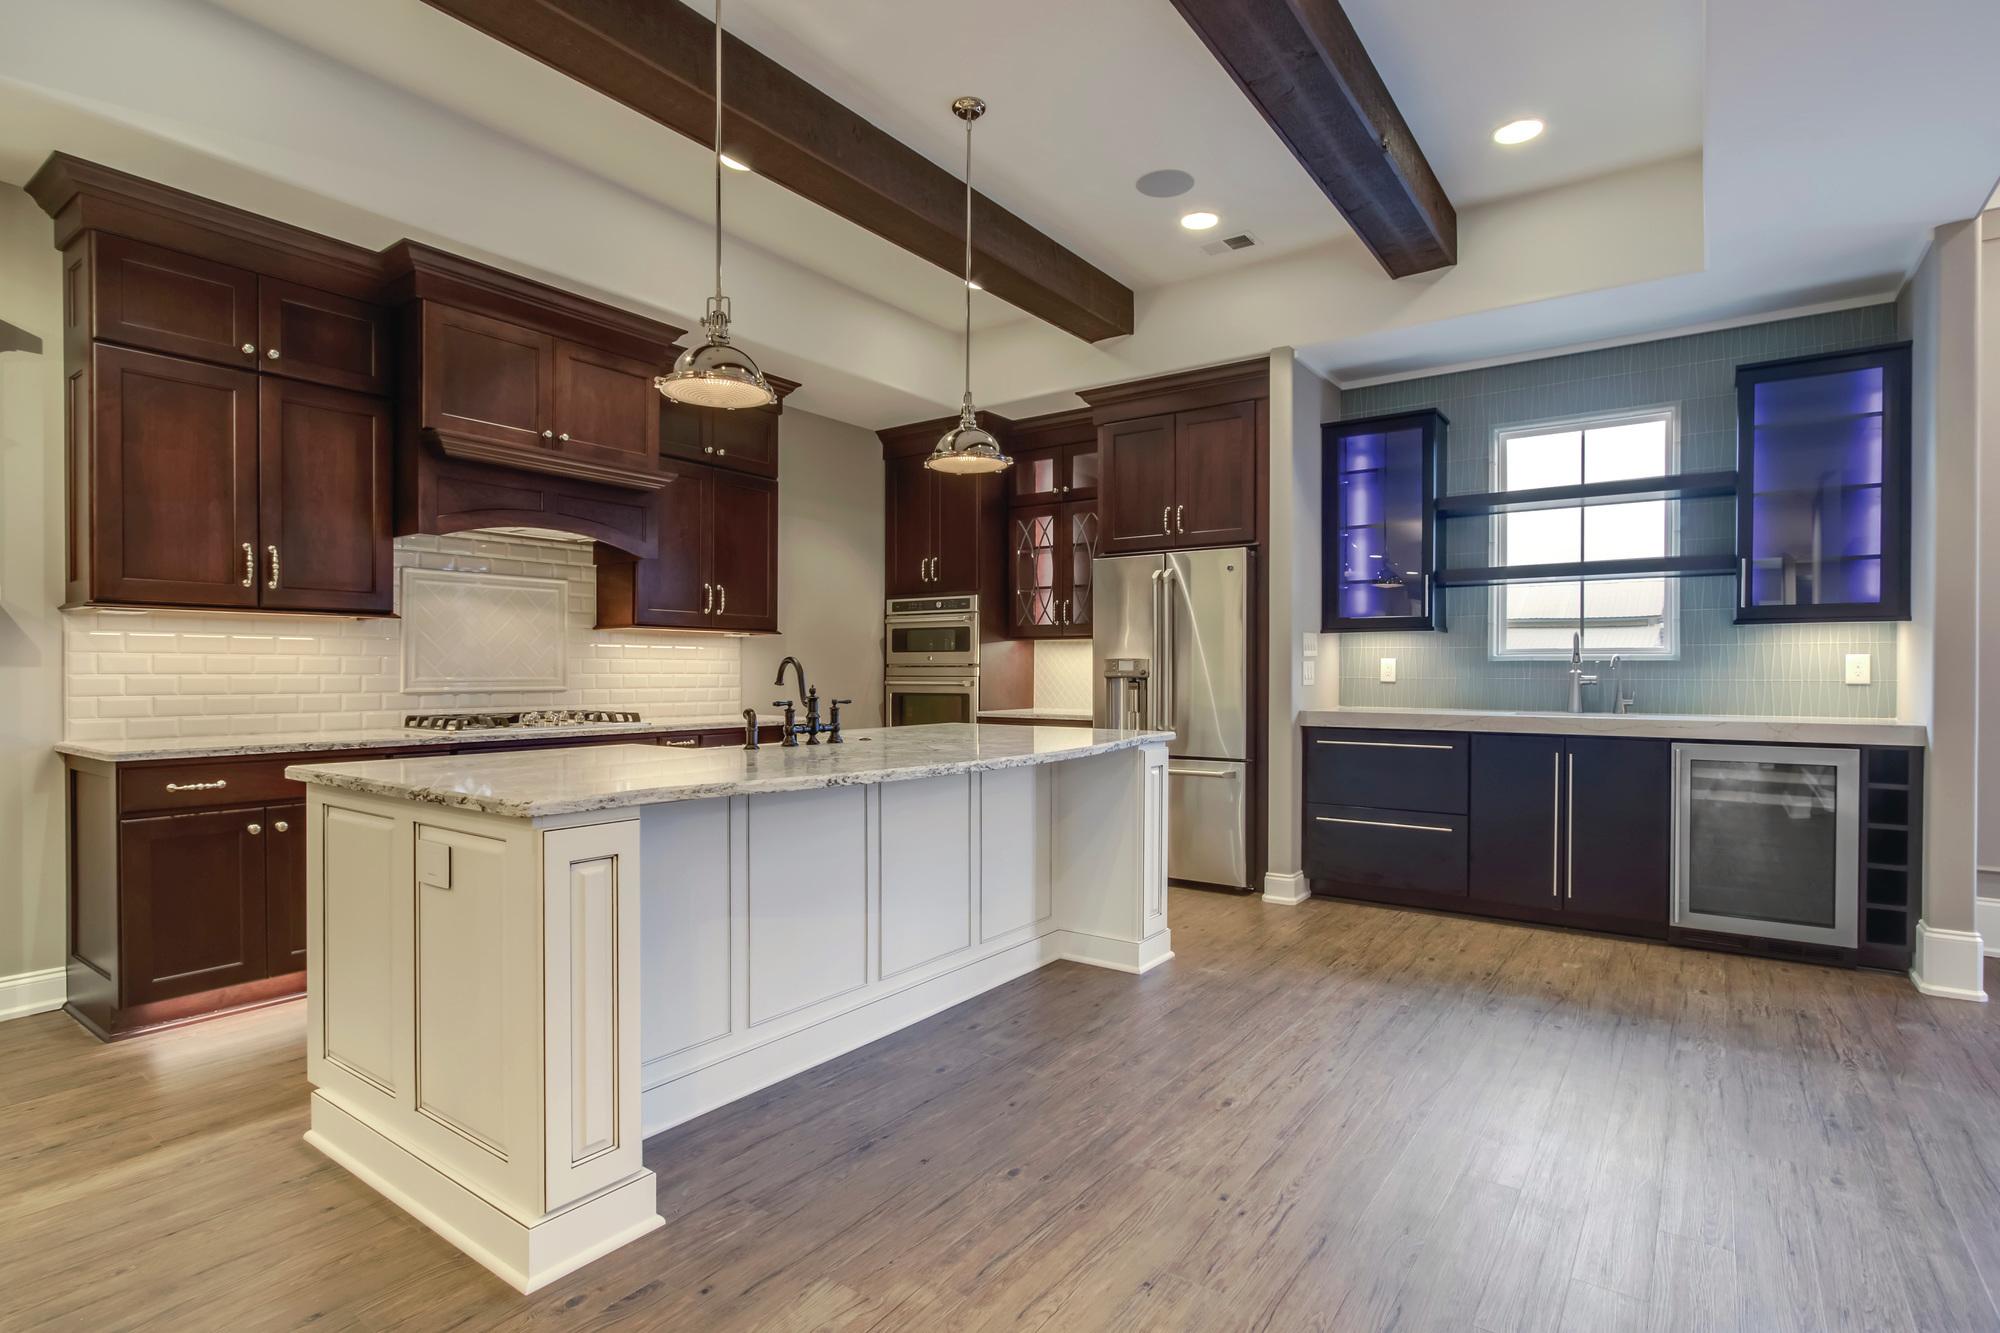 Furniture Design Center simple furniture design center property with additional